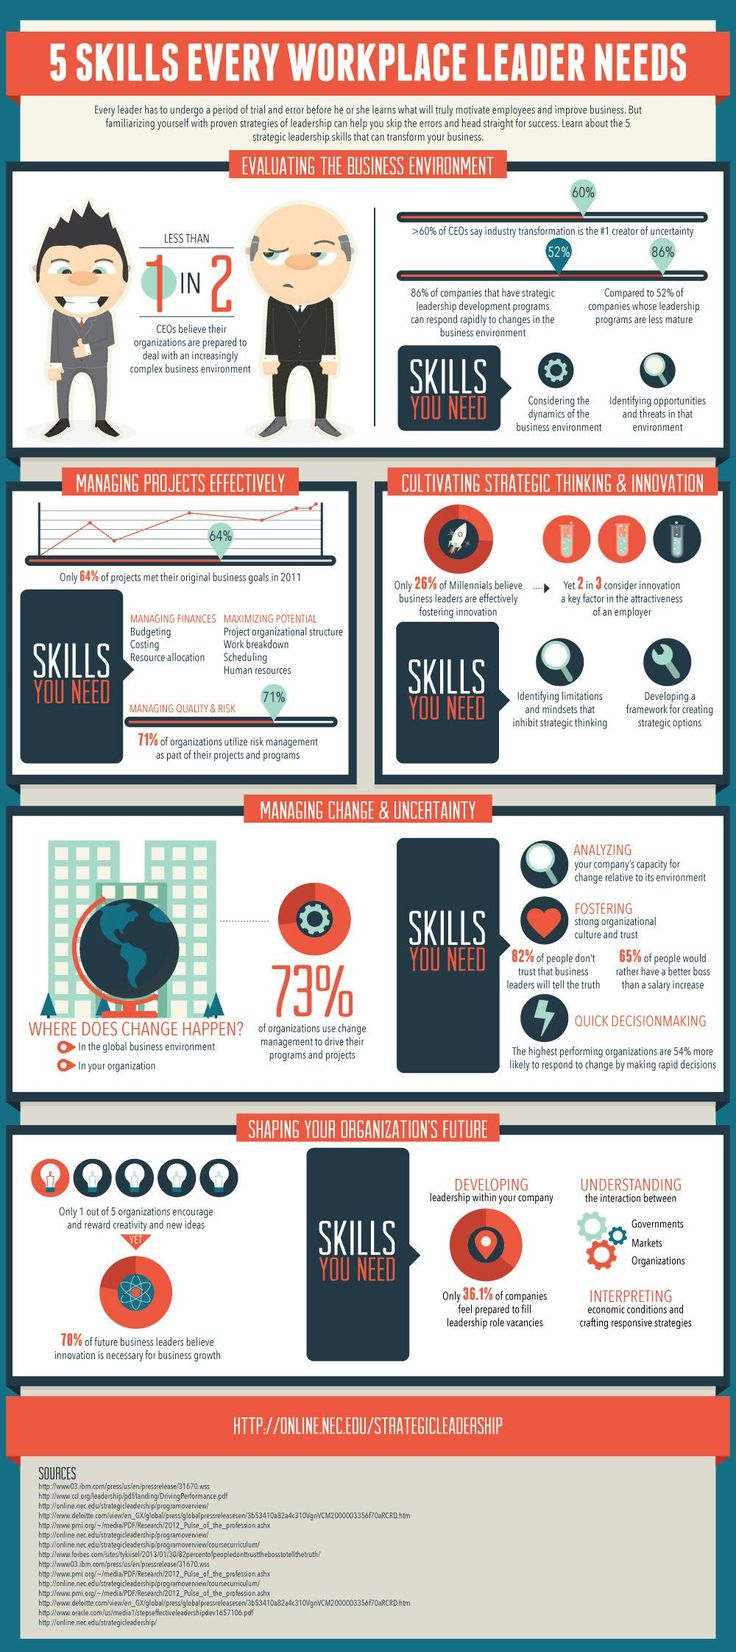 5 skills every workplace leader needs.